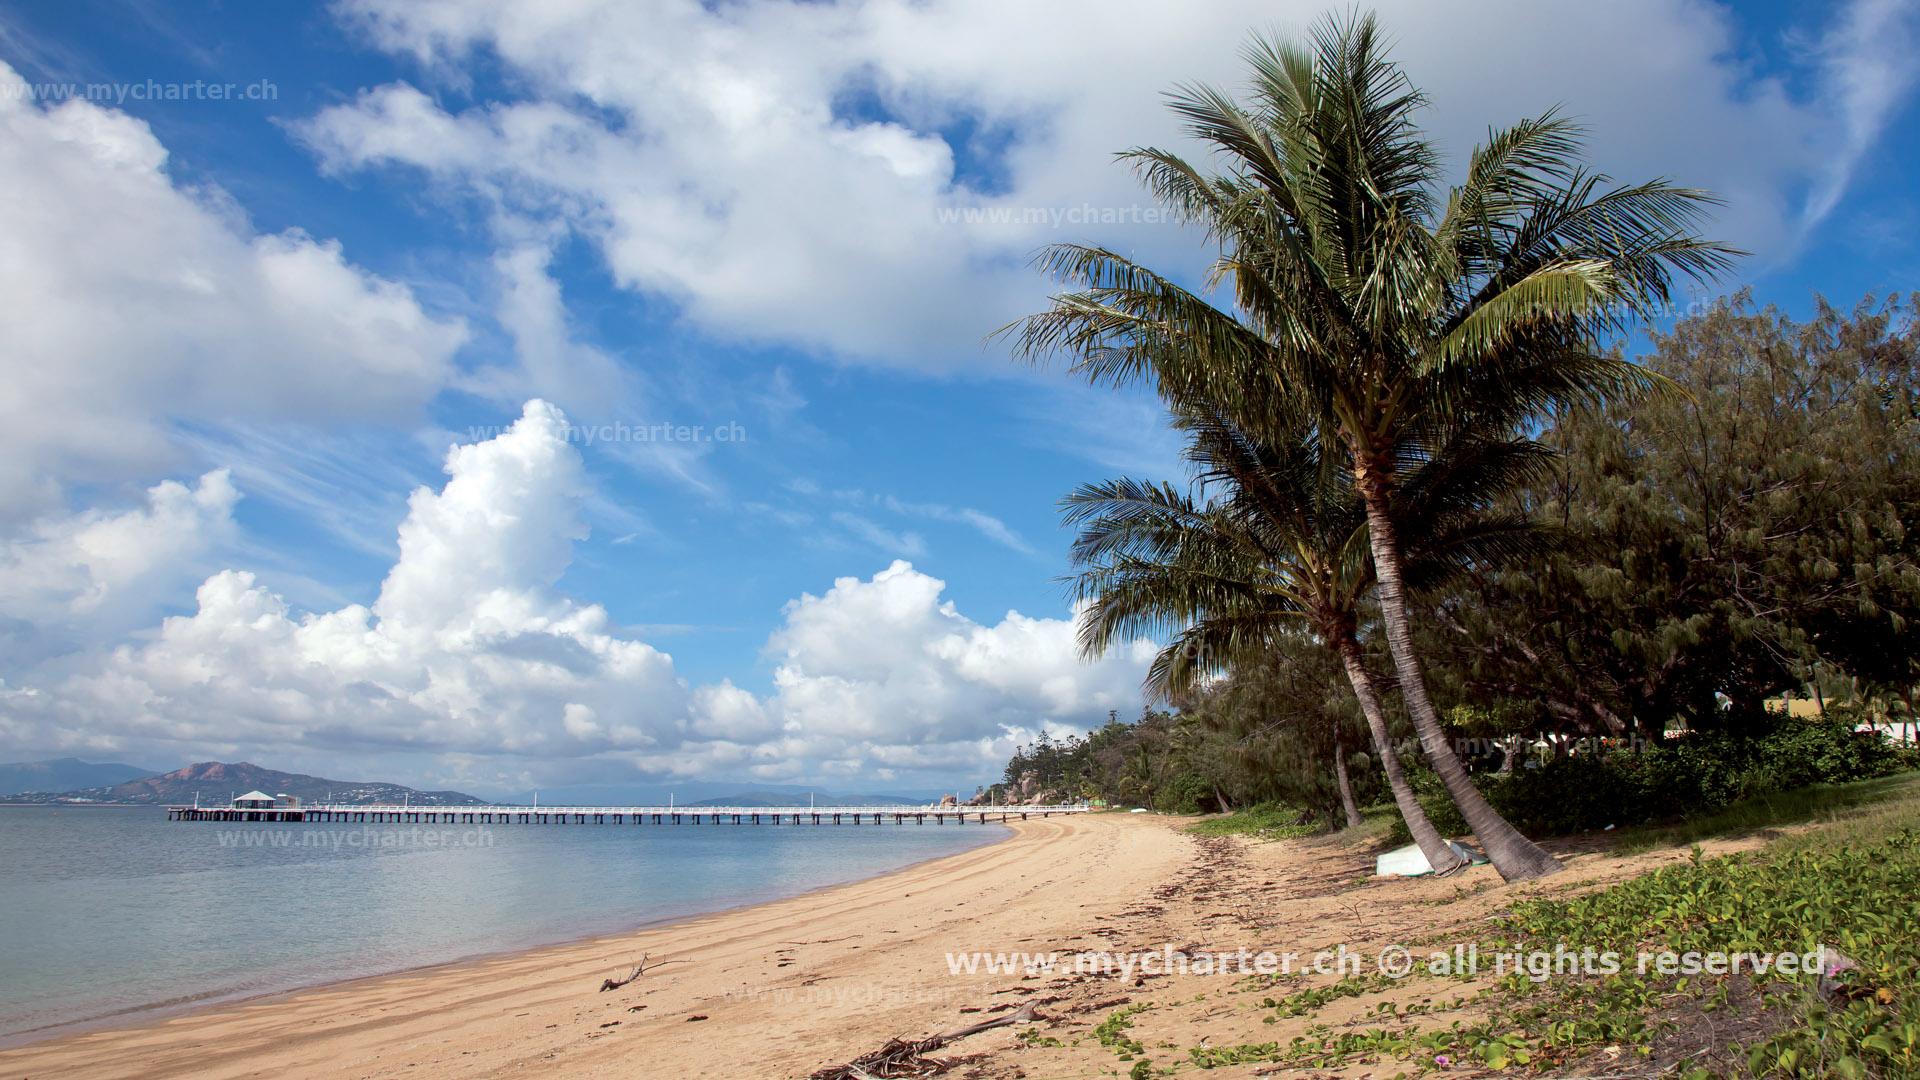 Yachtcharter Australien - Nelly Bay